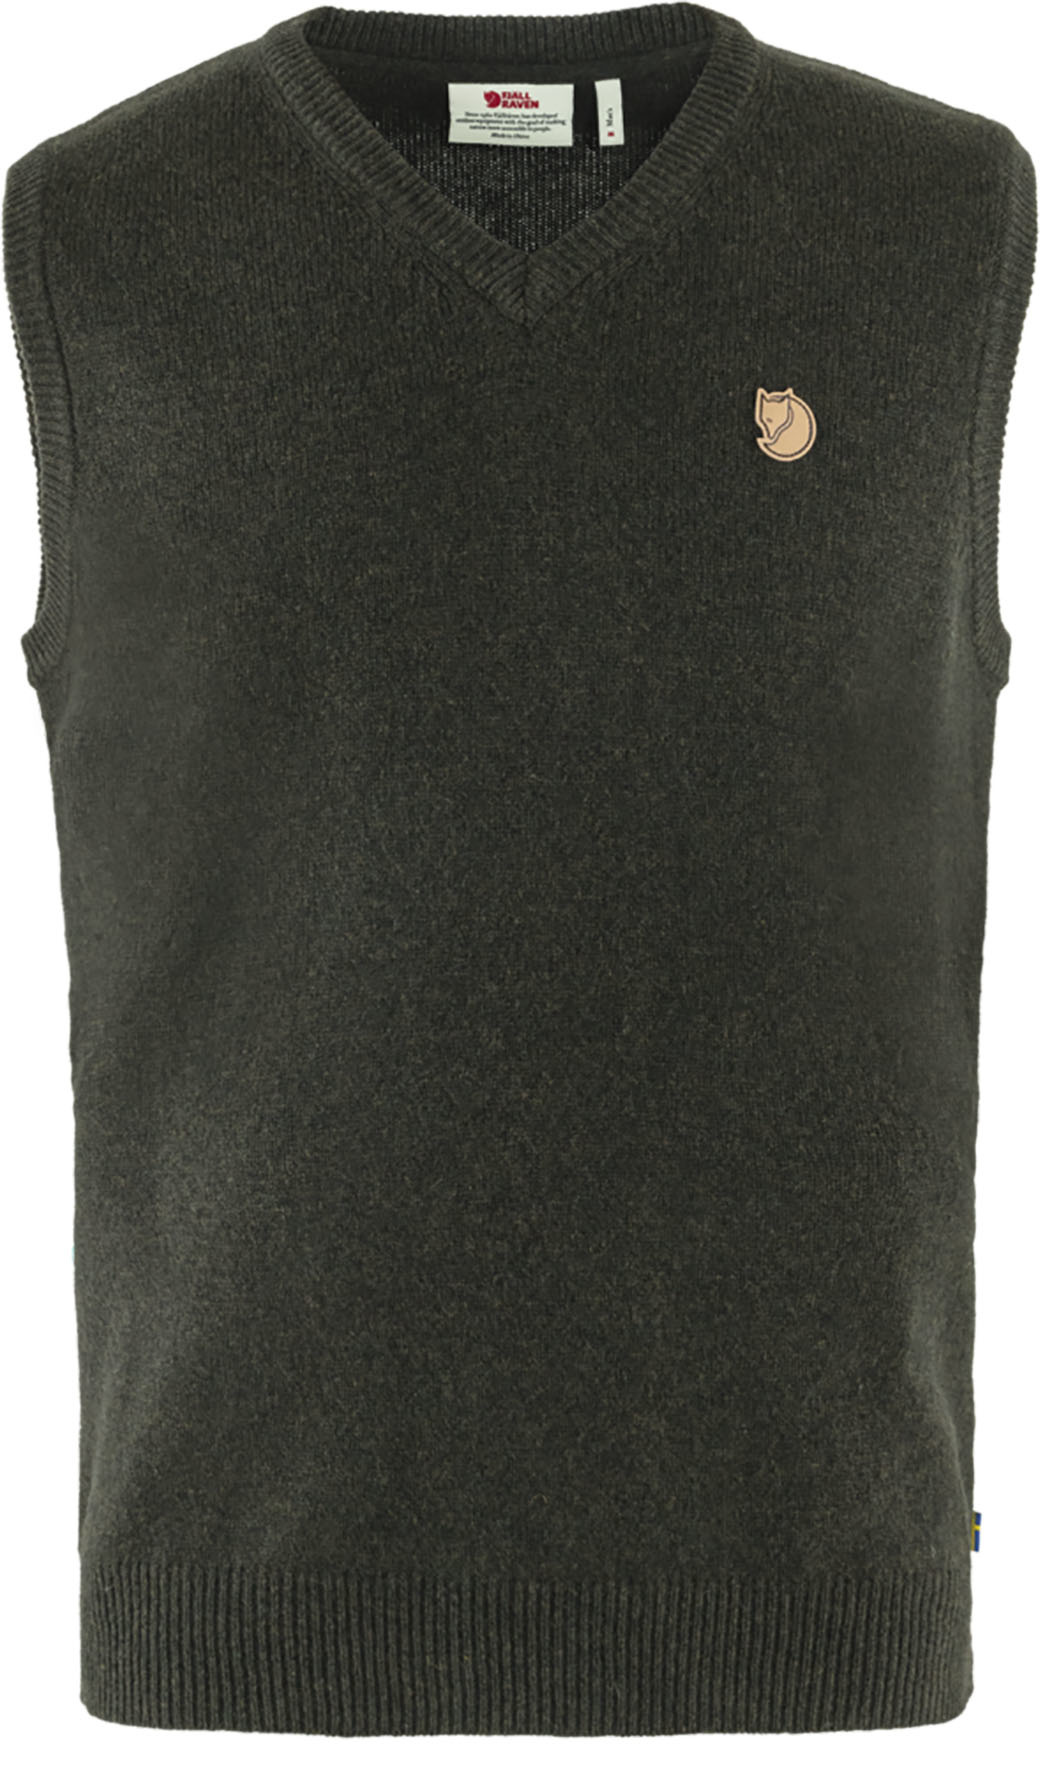 Fjällräven Övik Wool Vest M Dark Olive-1